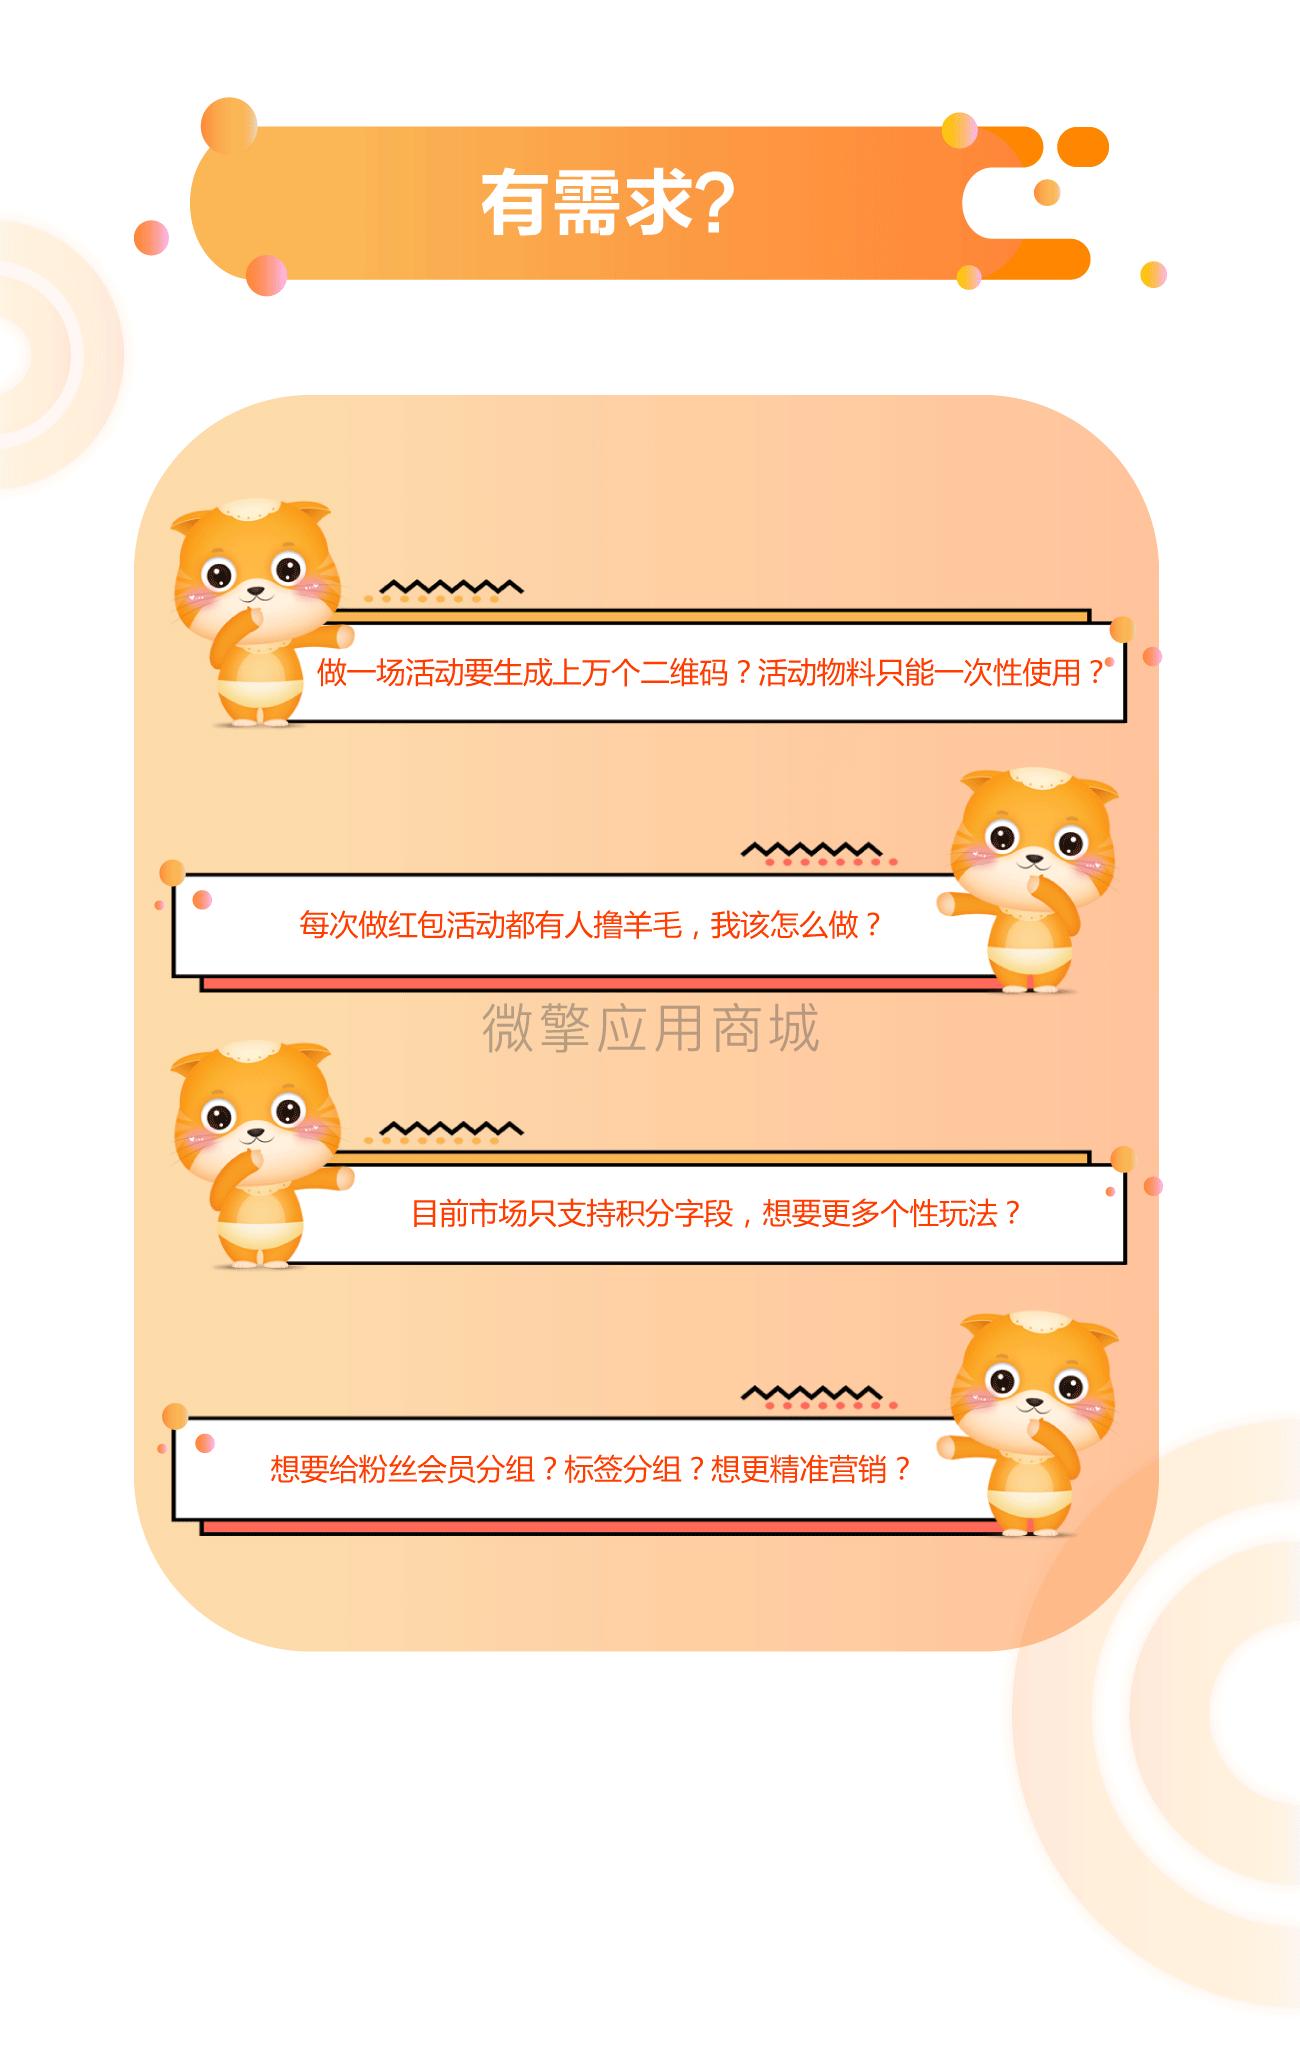 网站瀑布流_05.png